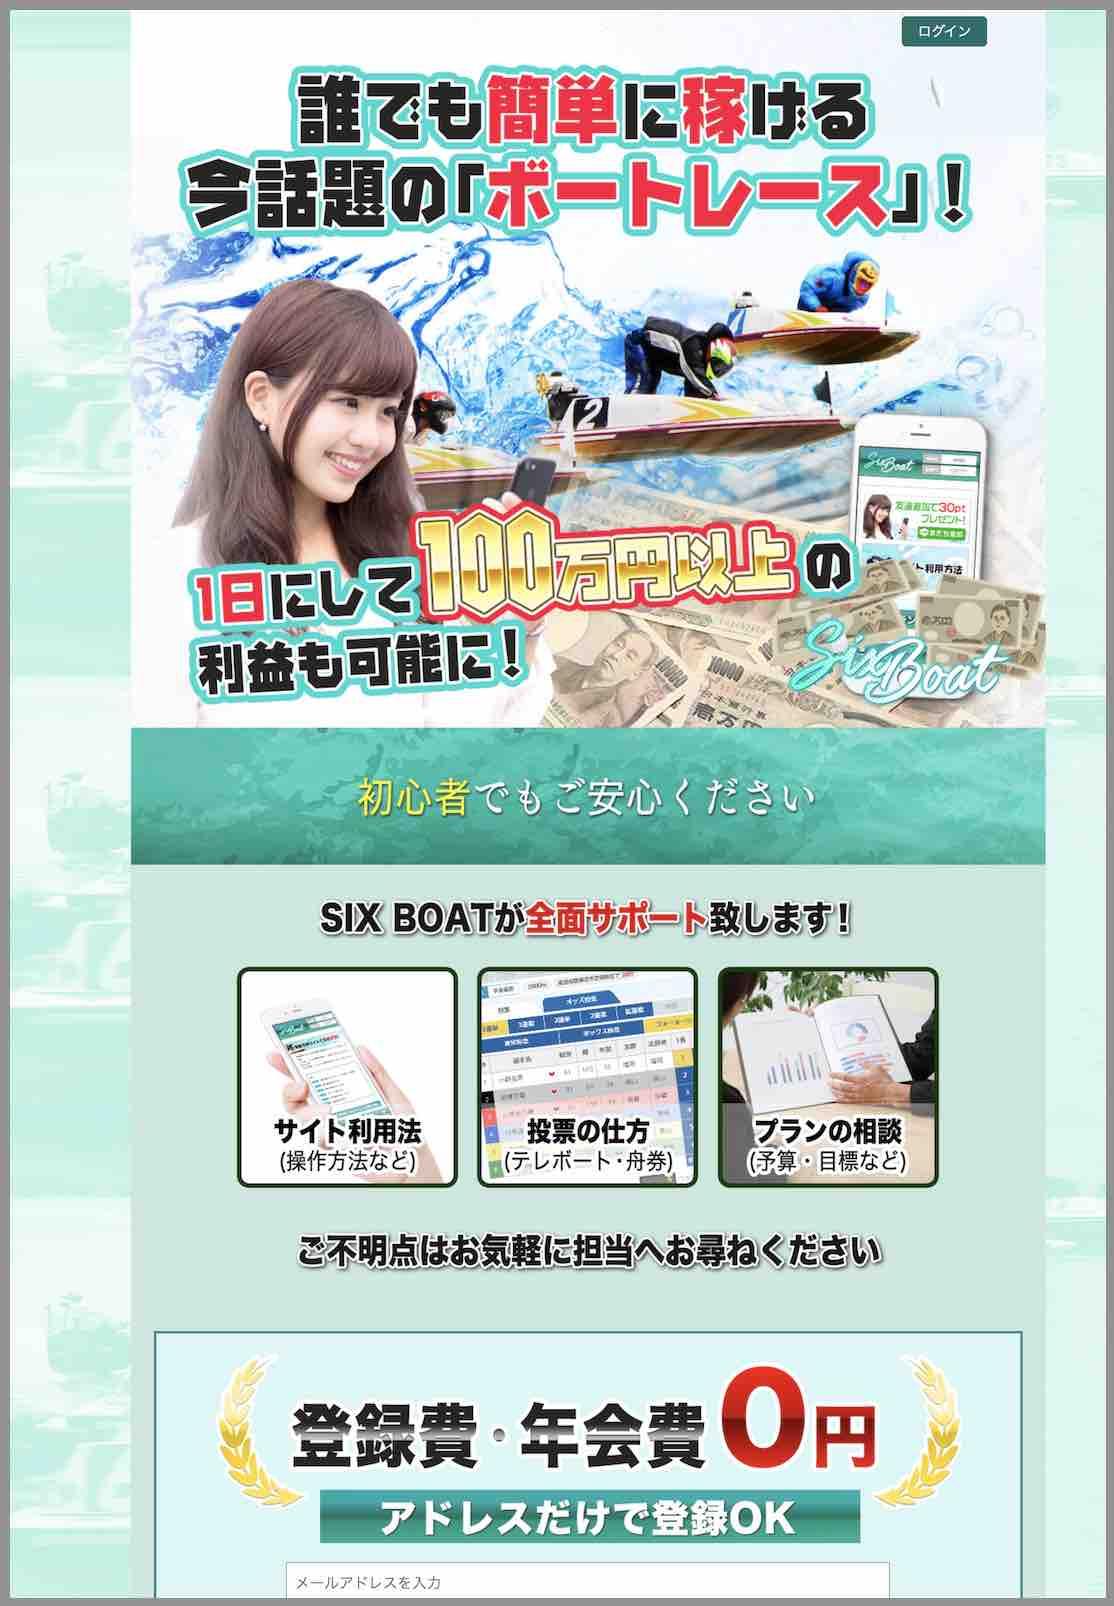 SIXBOAT(シックスボート)という競艇予想サイト(ボートレース予想サイト)の非会員ページ